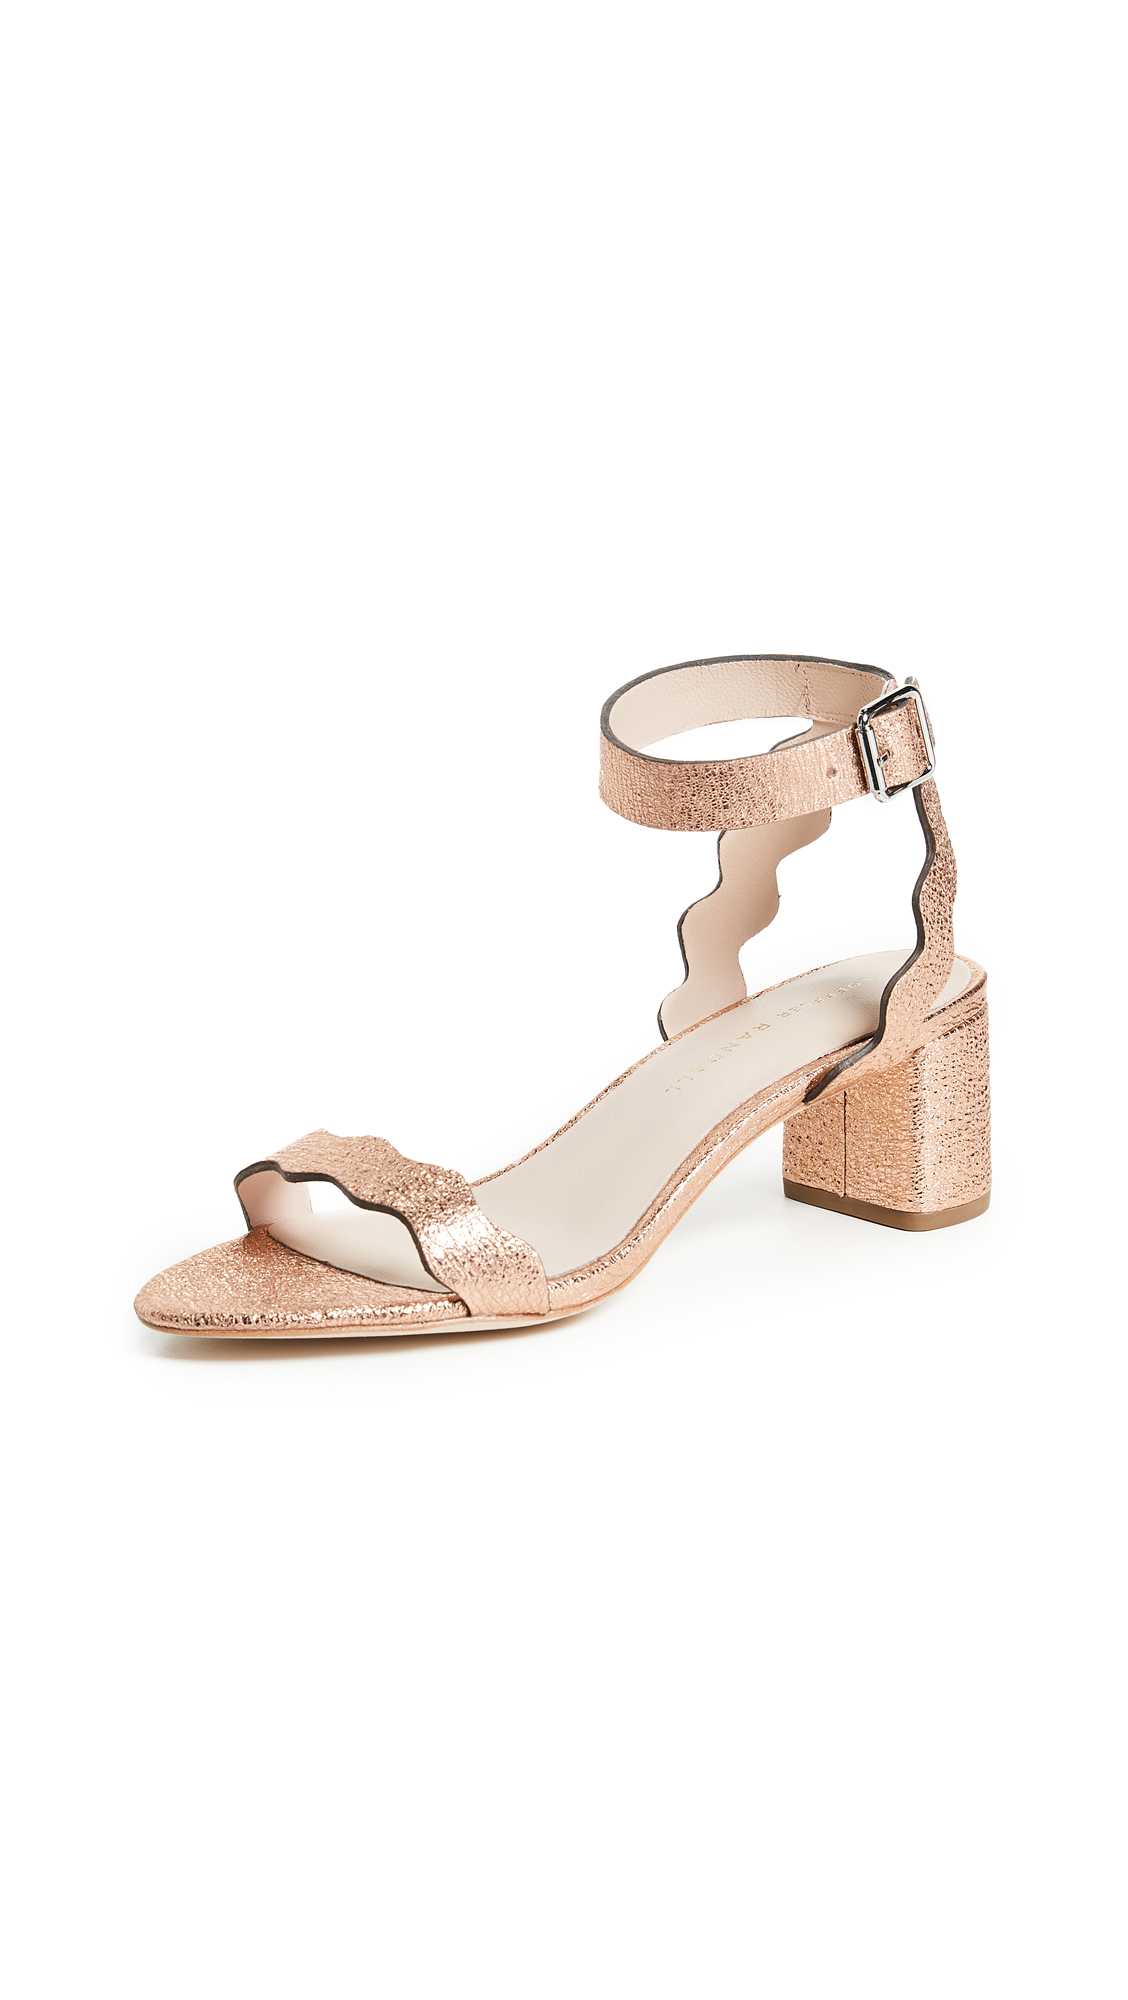 Loeffler Randall Emi City Sandals - Topaz